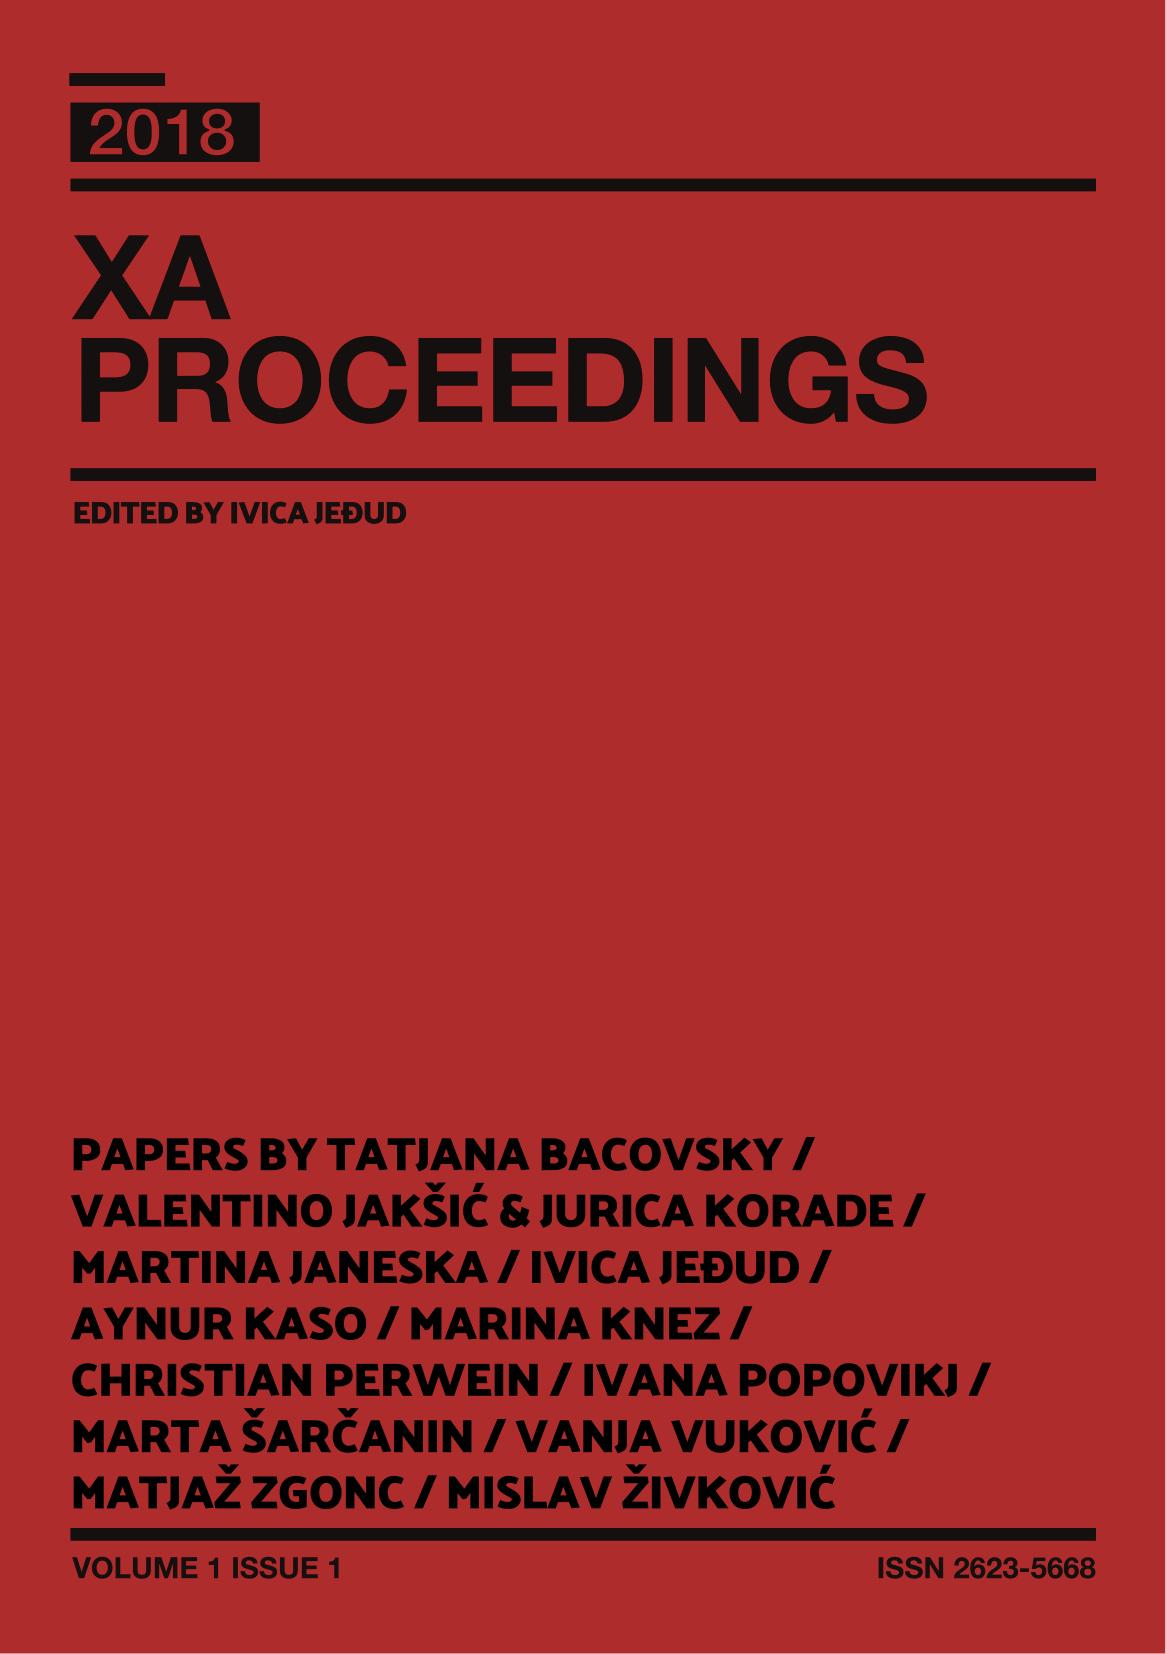 XA Proceedings